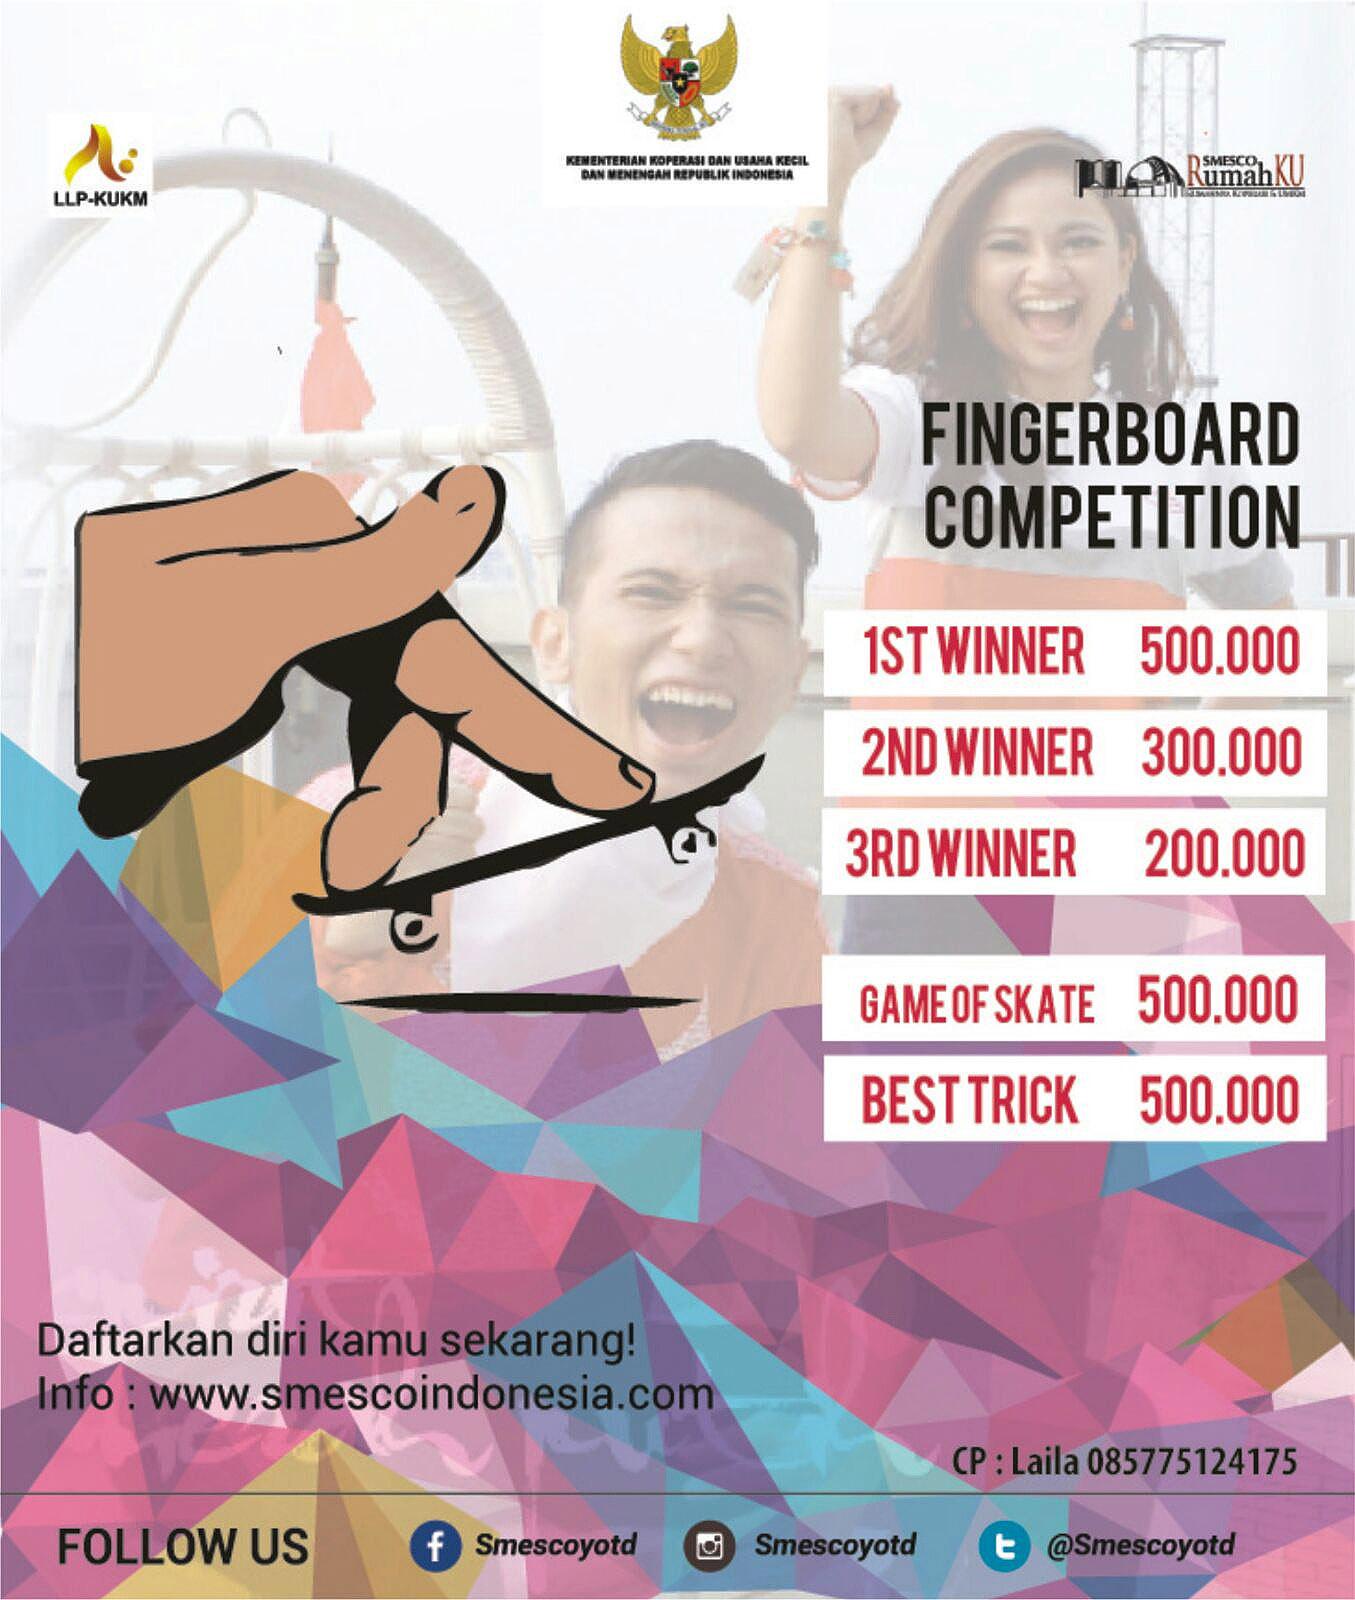 October 2015 Smesco Promo Produk Ukm Bumn Kain Batik Handmade Warna Alam Finger Board Competition